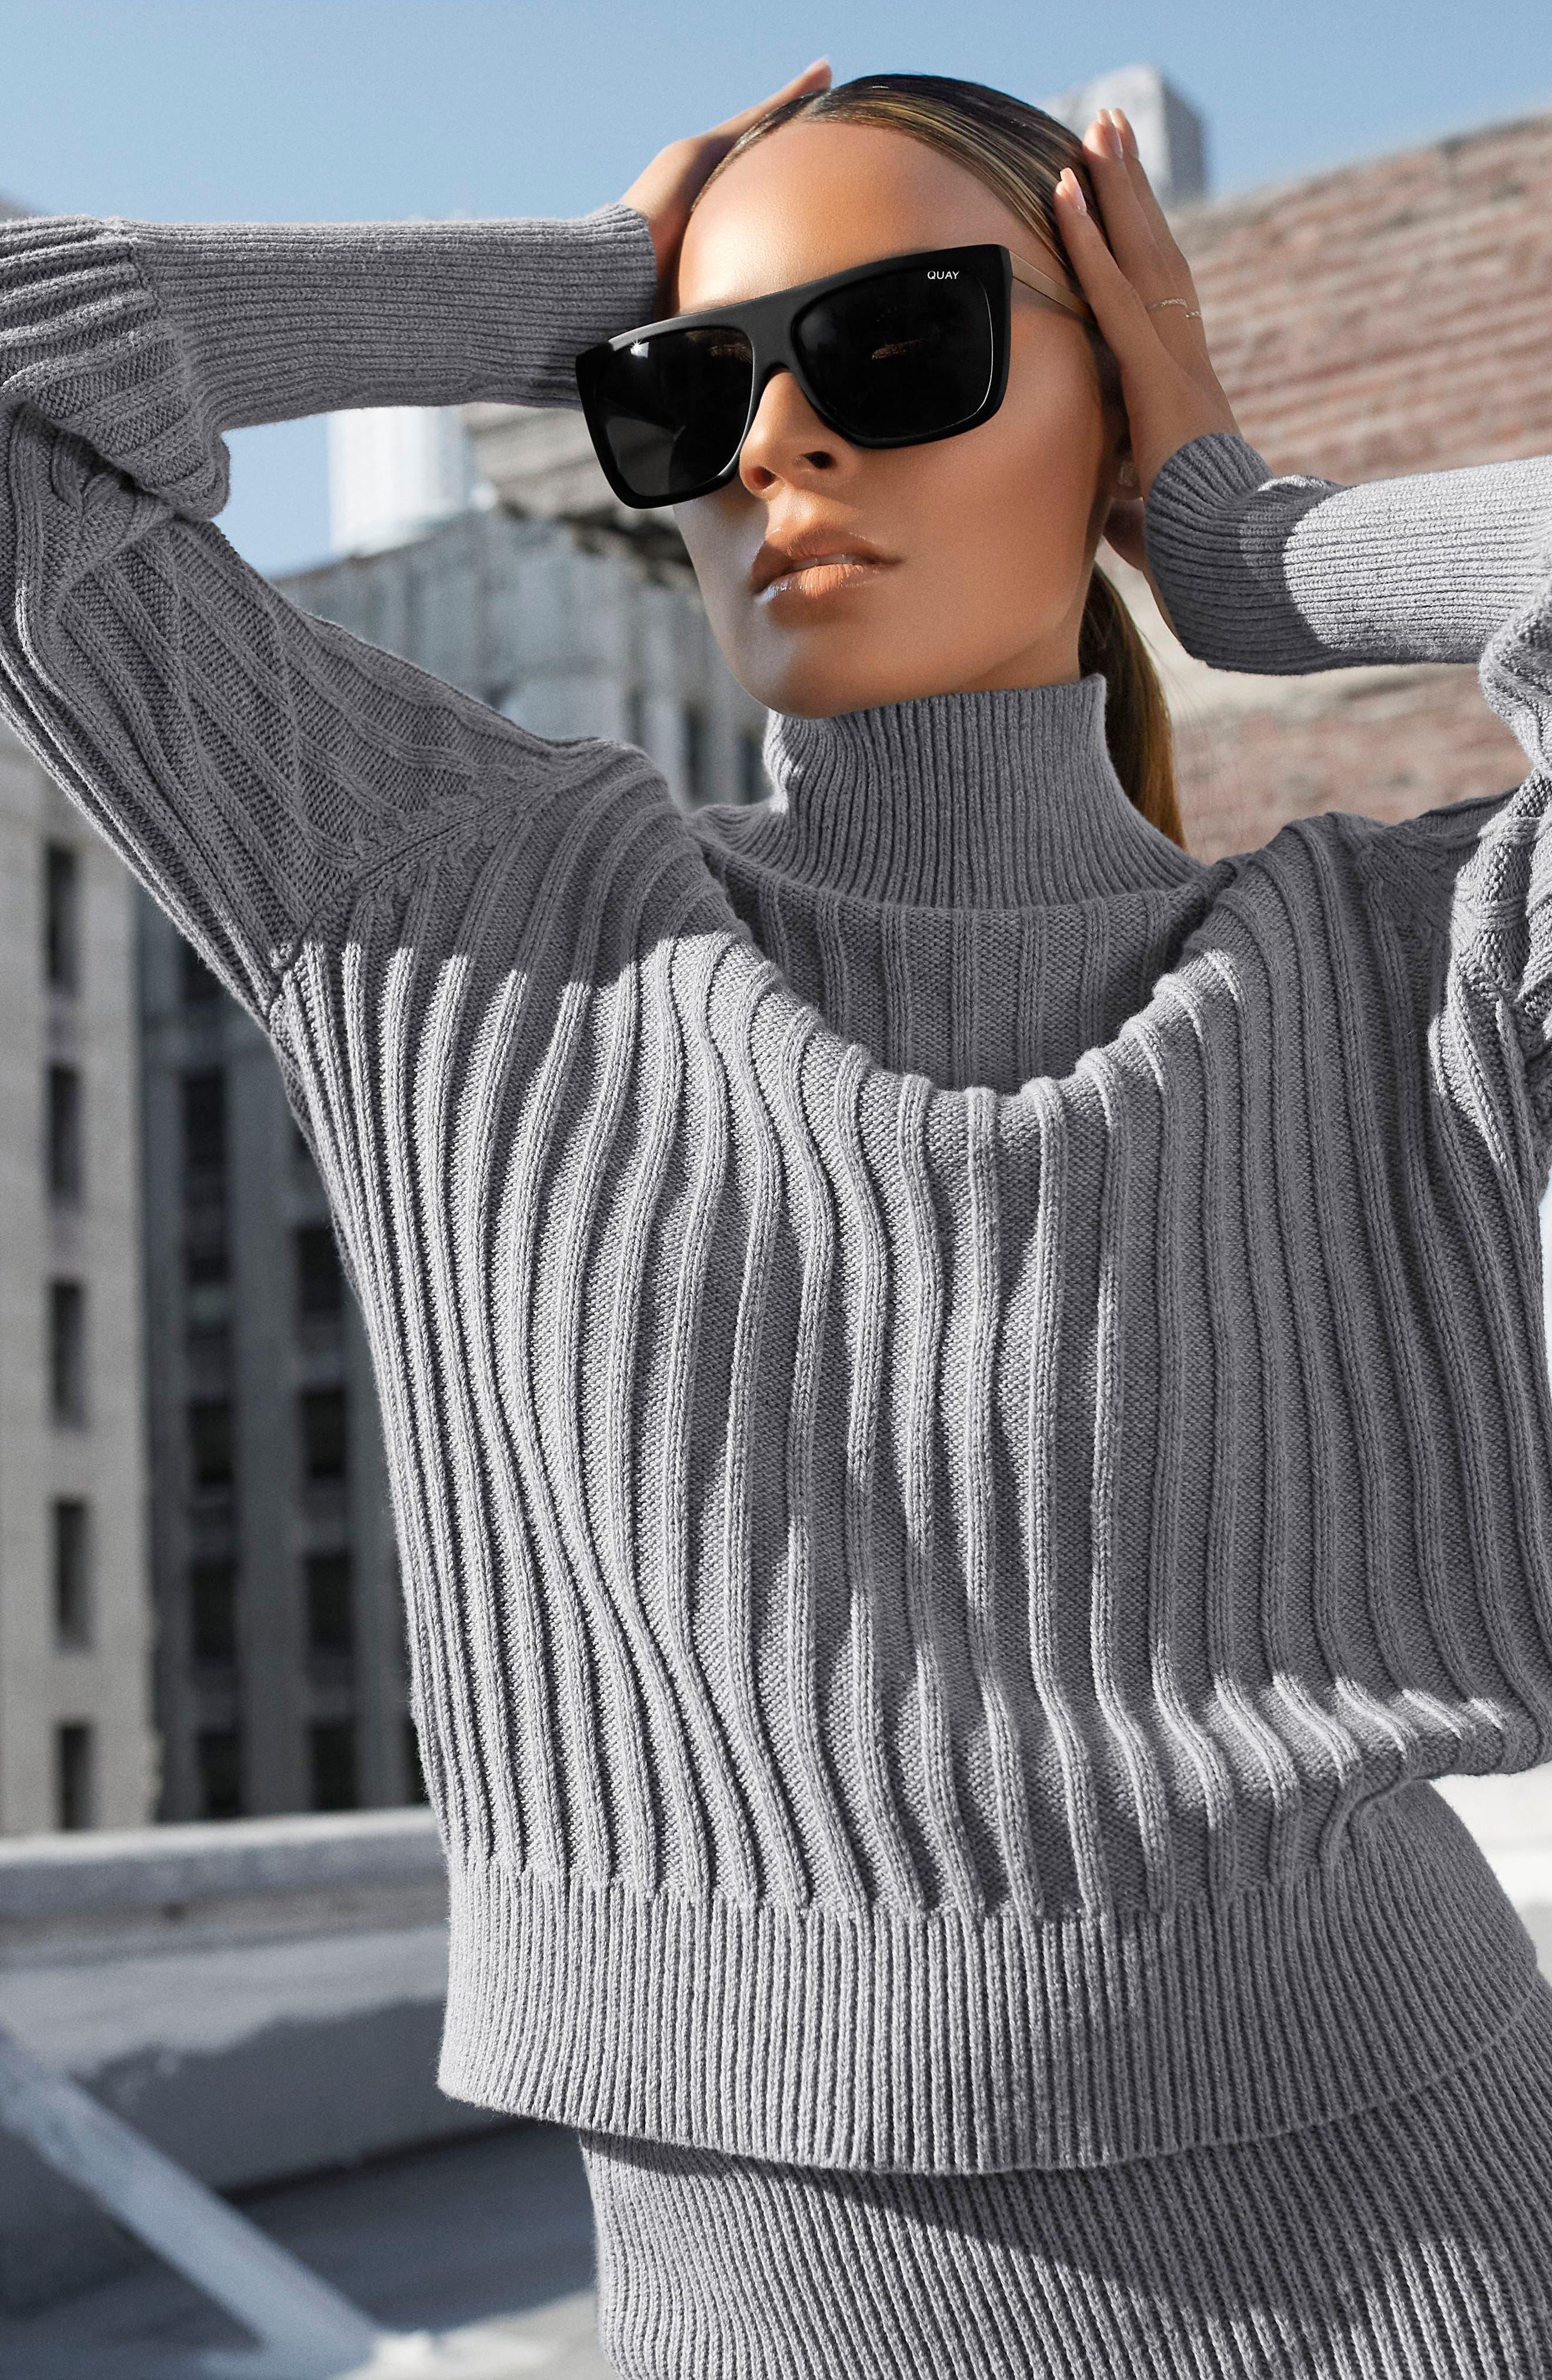 QUAY AUSTRALIA, x Desi Perkins On the Low 60mm Square Sunglasses, Alternate thumbnail 6, color, BLACK/ SMOKE